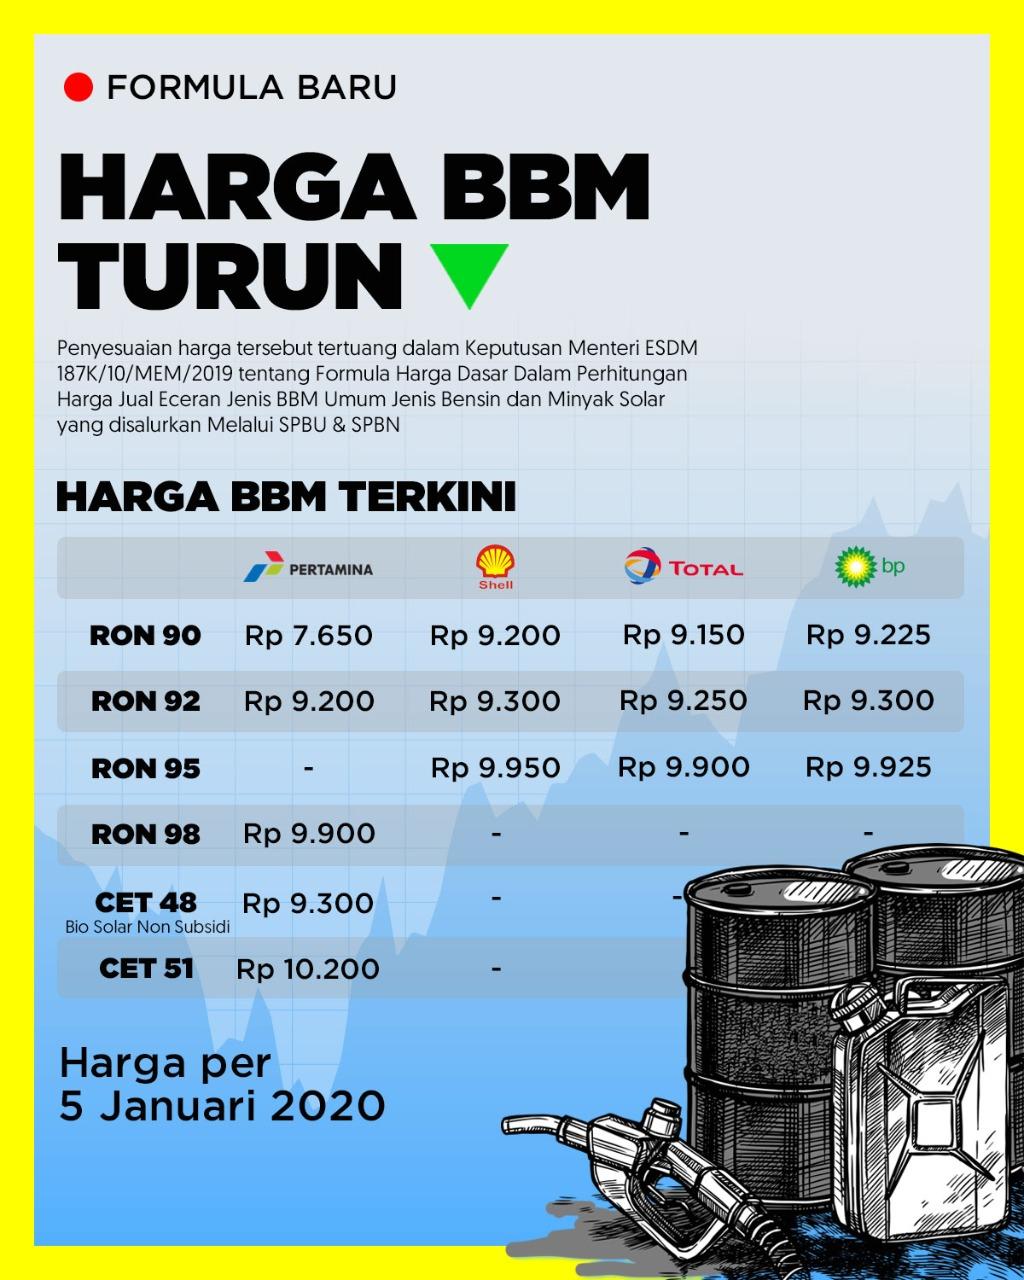 Kementerian Esdm Ri Media Center Arsip Berita Harga Bbm Umum Turun Buah Implementasi Kepmen Formula Harga Bbm Baru